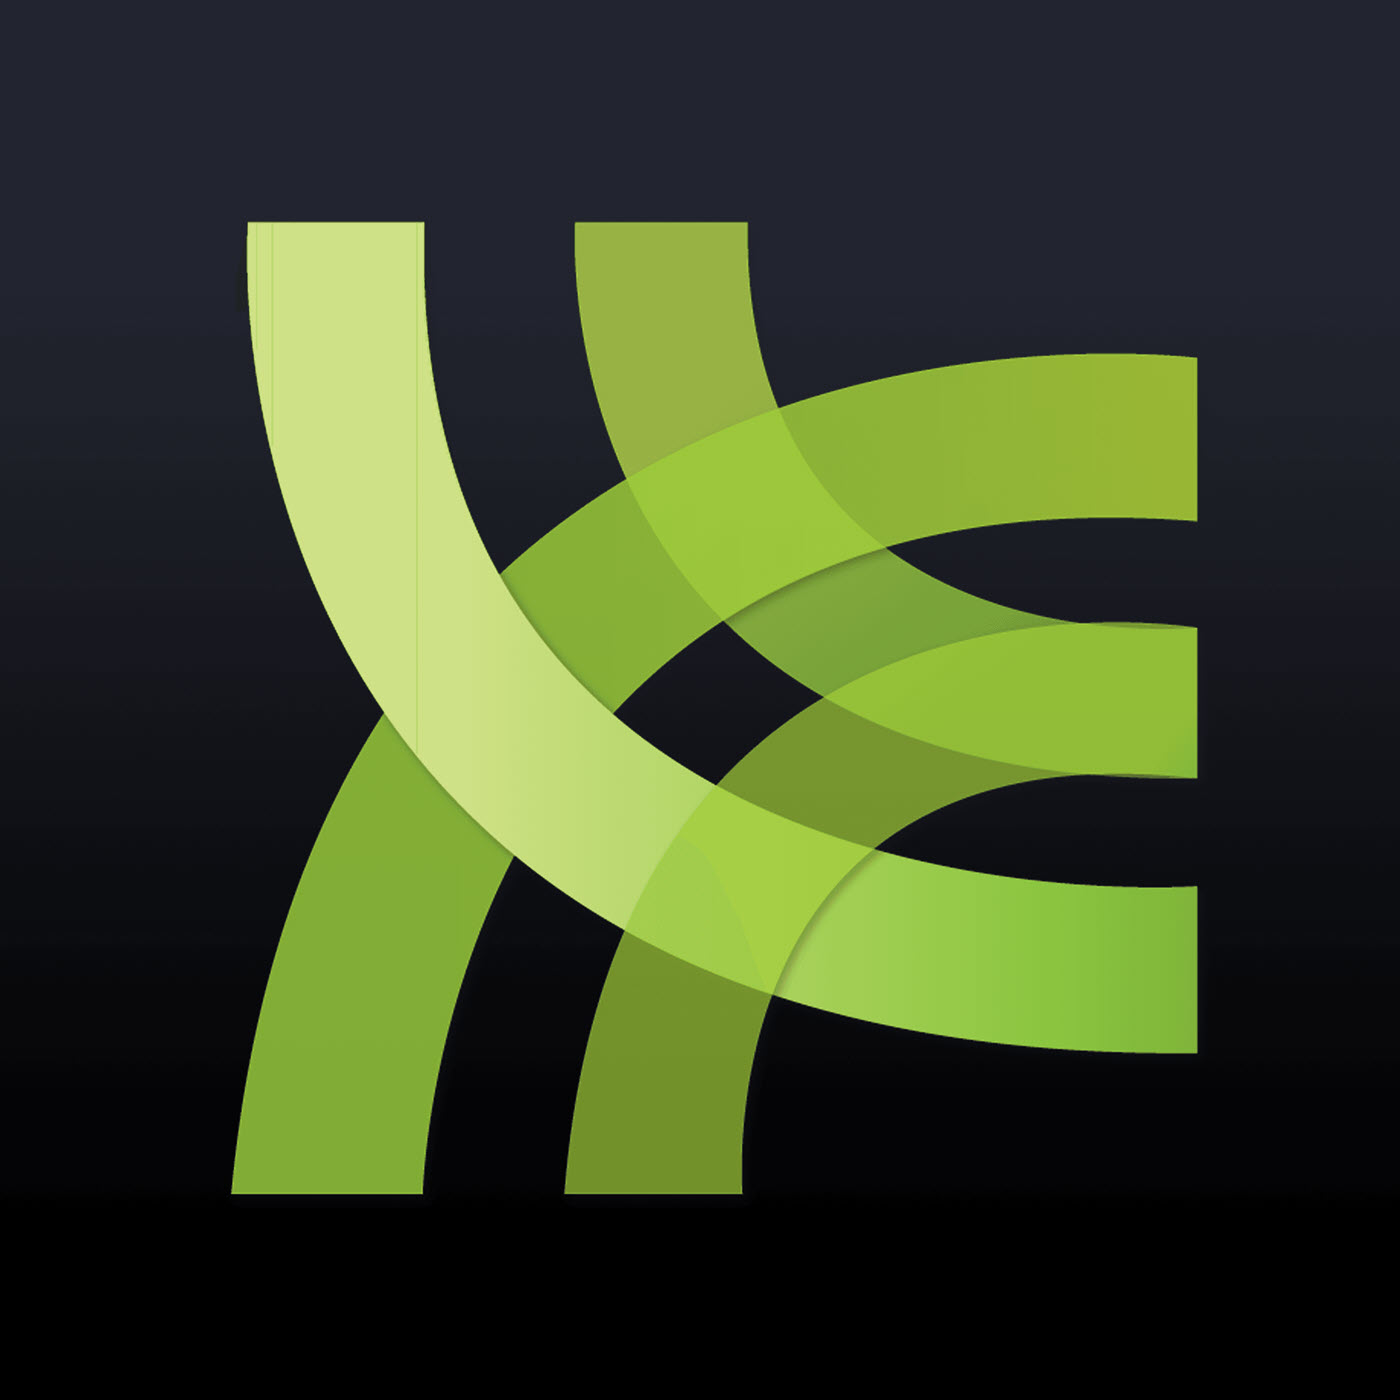 LIAKPodcast logo